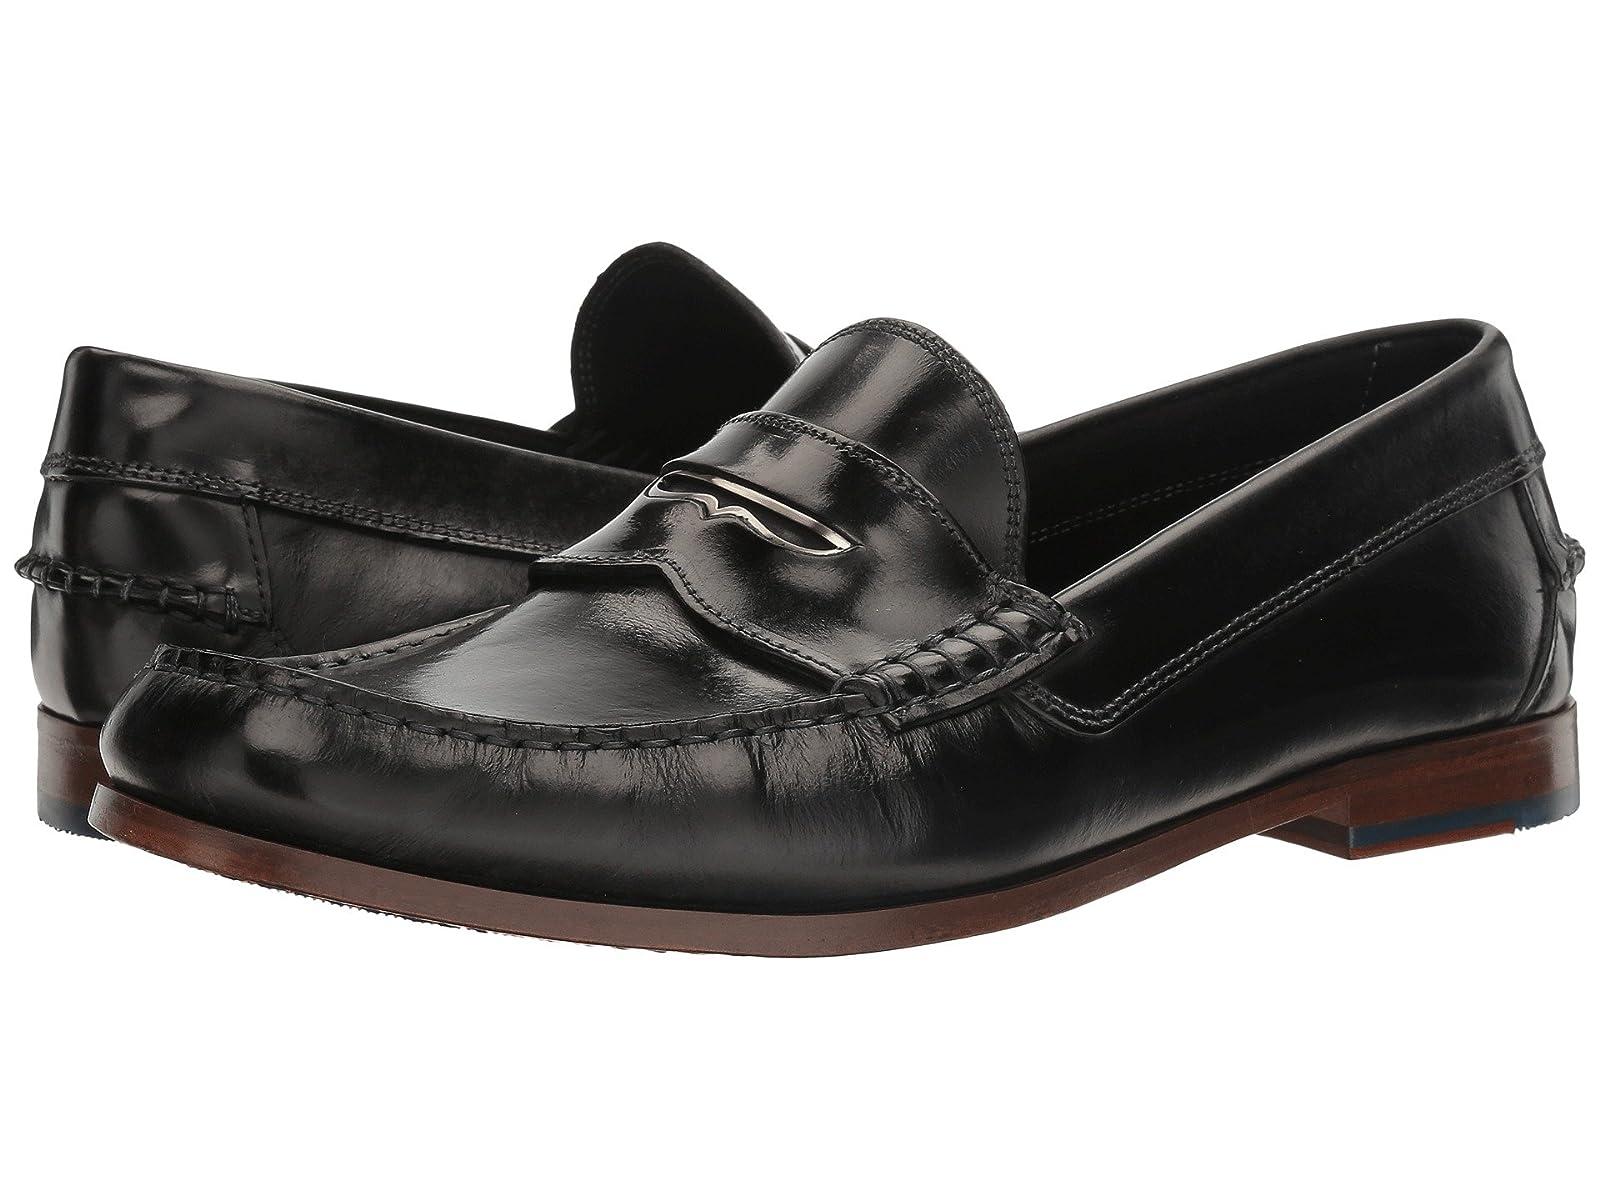 Donald J Pliner NataleCheap and distinctive eye-catching shoes